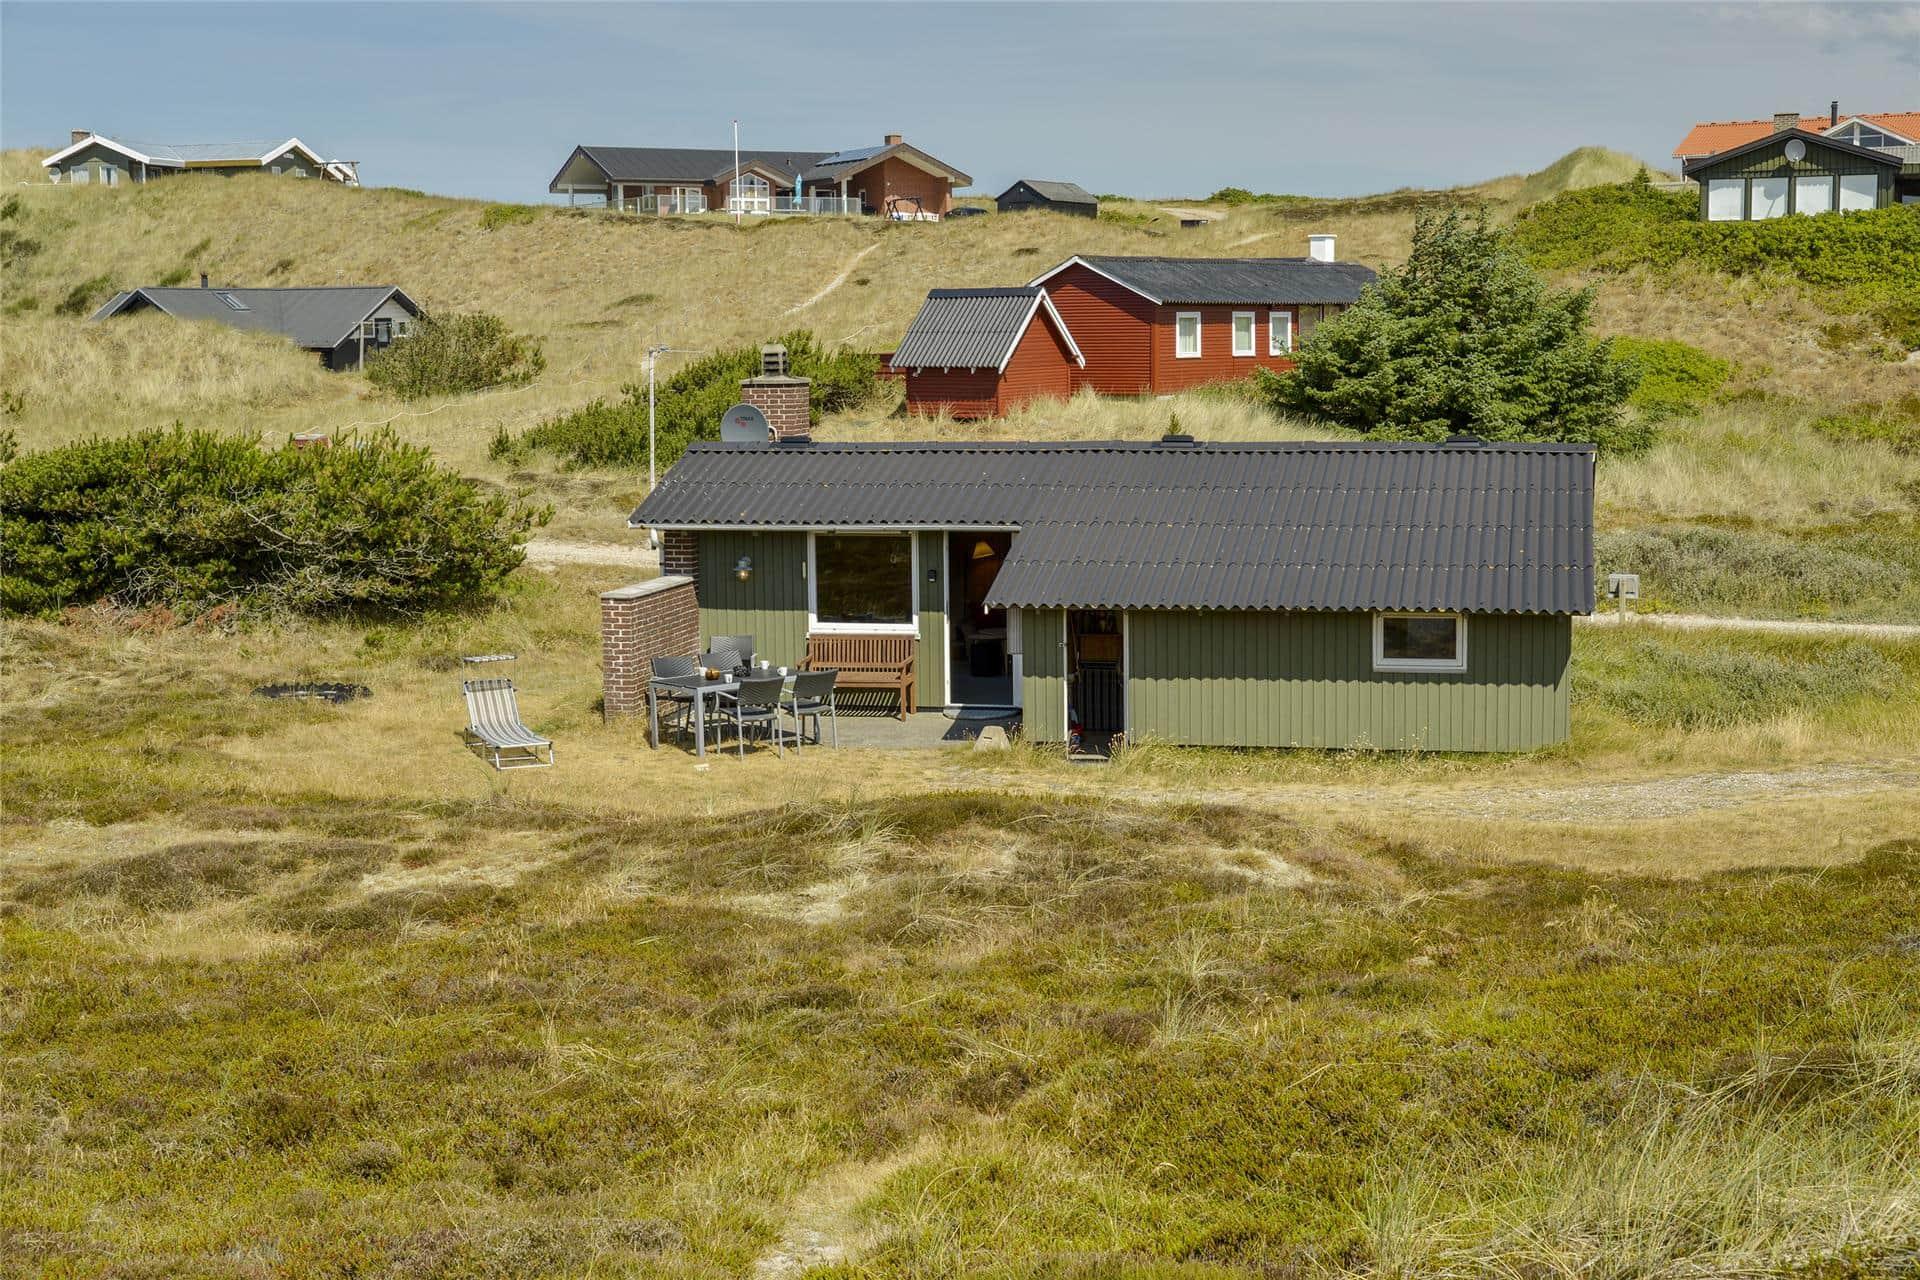 Bild 1-4 Ferienhaus 538, Havvej 15, DK - 6960 Hvide Sande